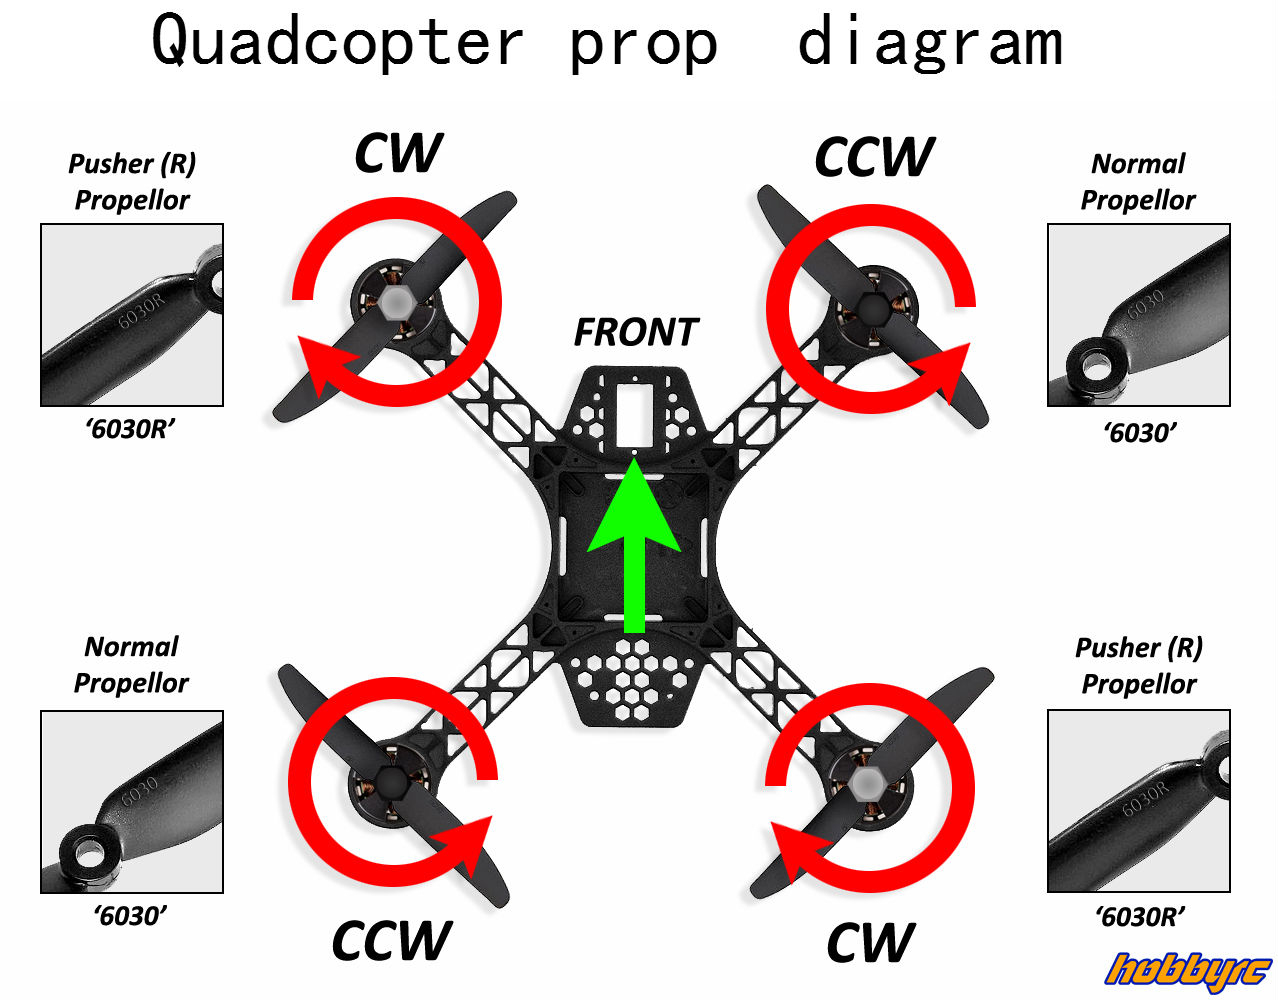 Quadcopter Wiring Diagram Manual | Wiring Diagram - Pixhawk Wiring Diagram